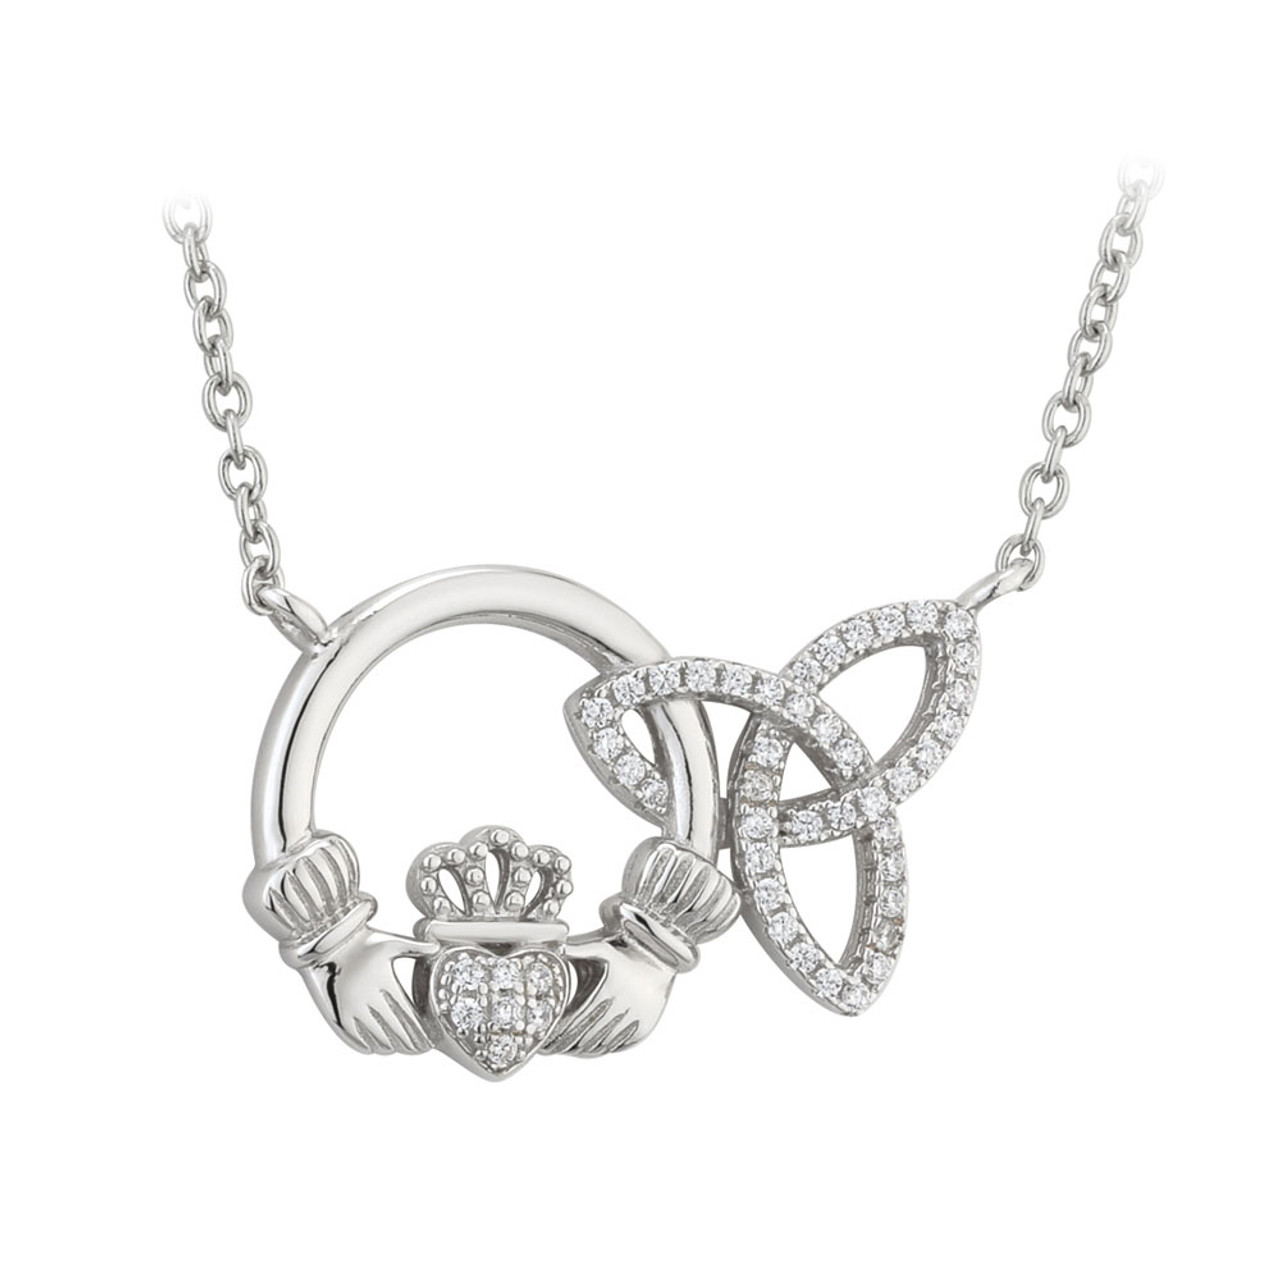 Irish Celtic Claddagh and Trinity Knot Pendant